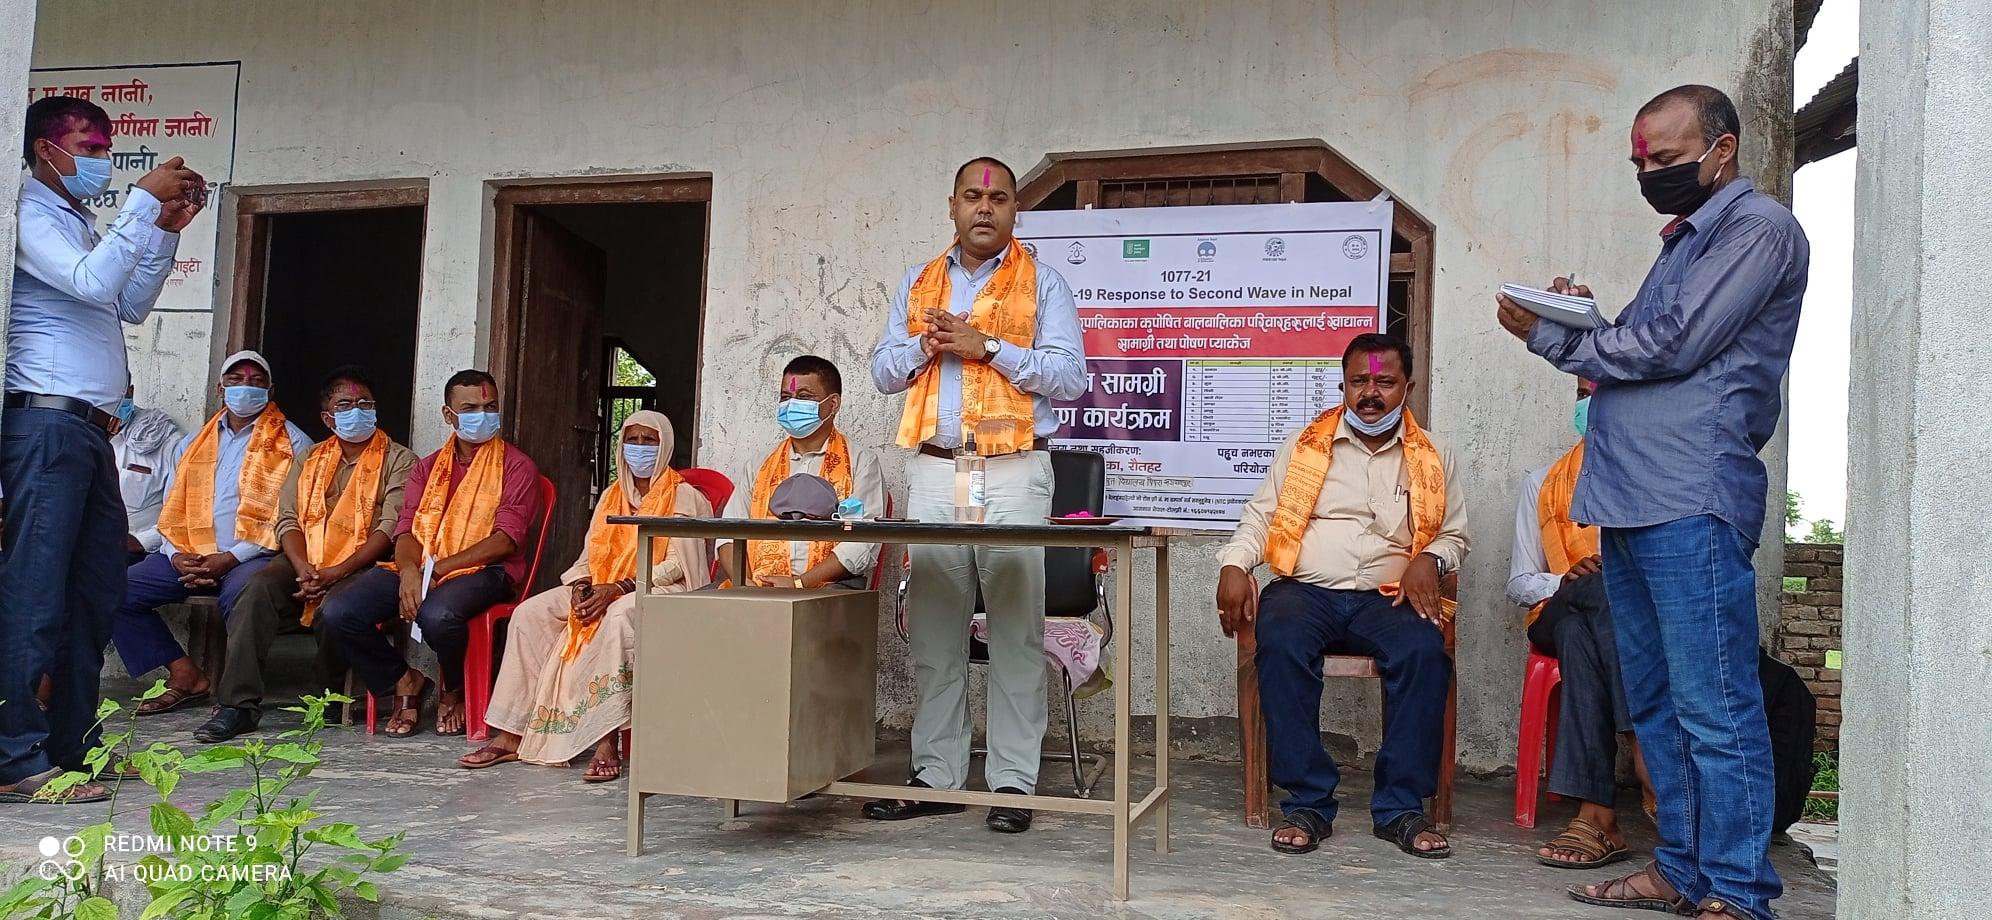 food-distribution-program-for-children-HHs-at-Rajpur-municipality-Rautahat-03